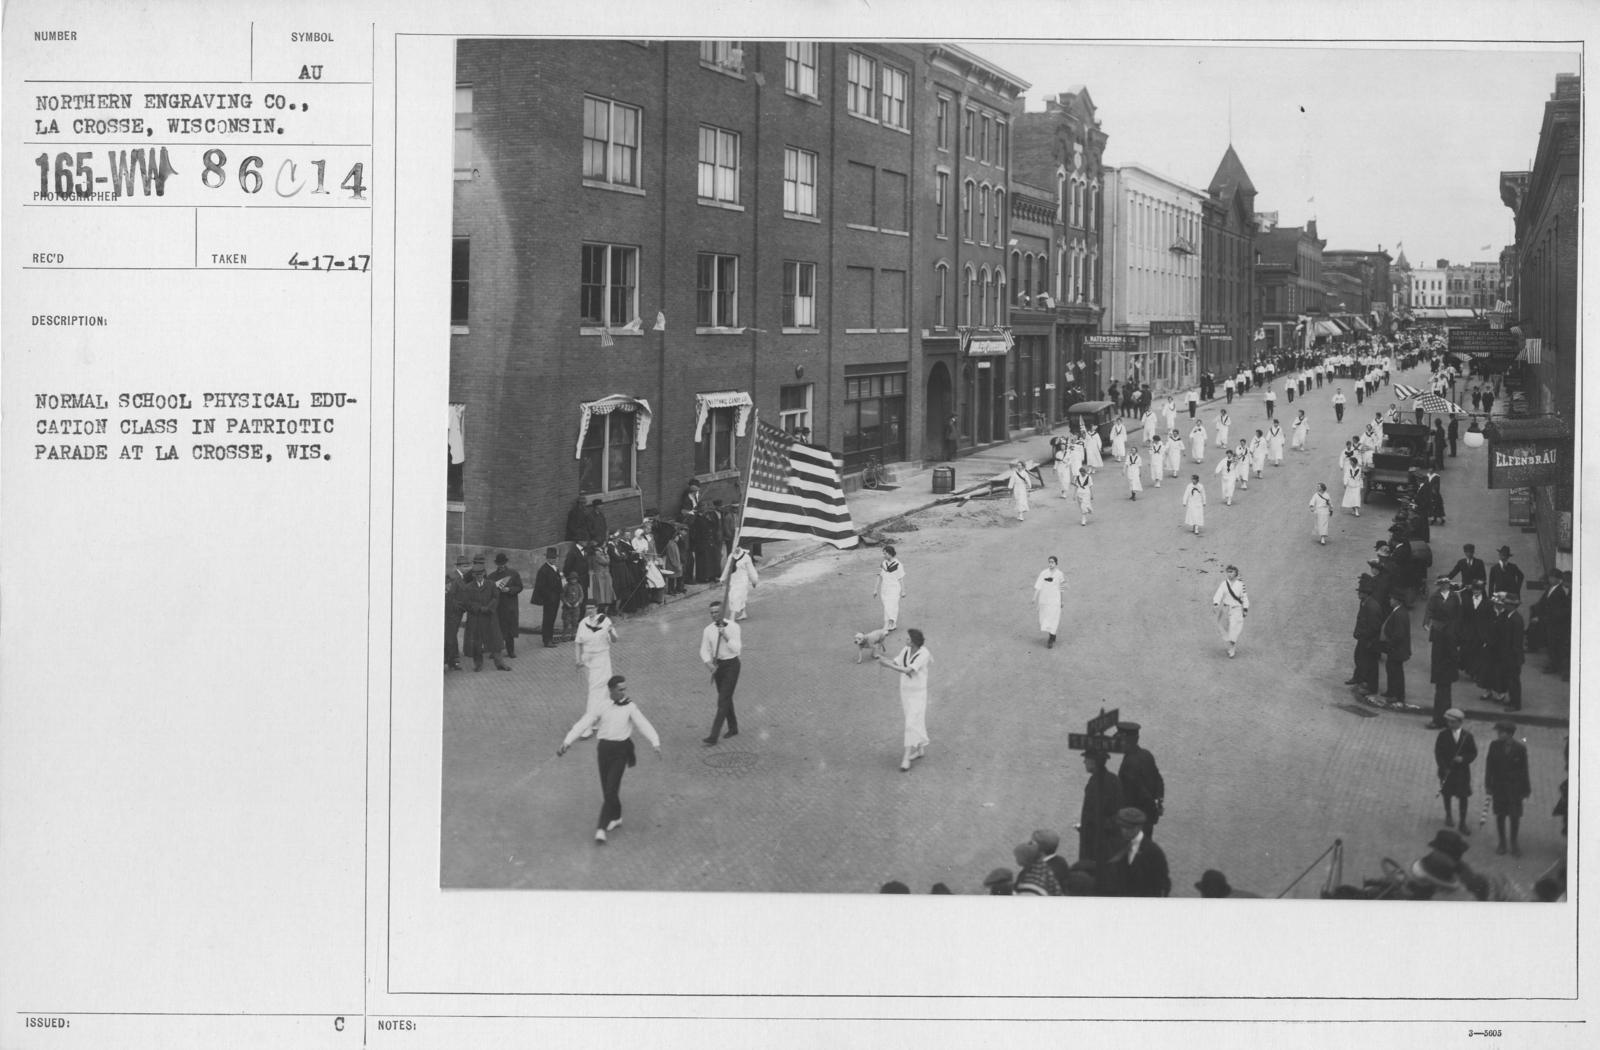 Ceremonies and Parades - Normal School Physical Education Class in Patriotic Parade at La Crosse, Wish